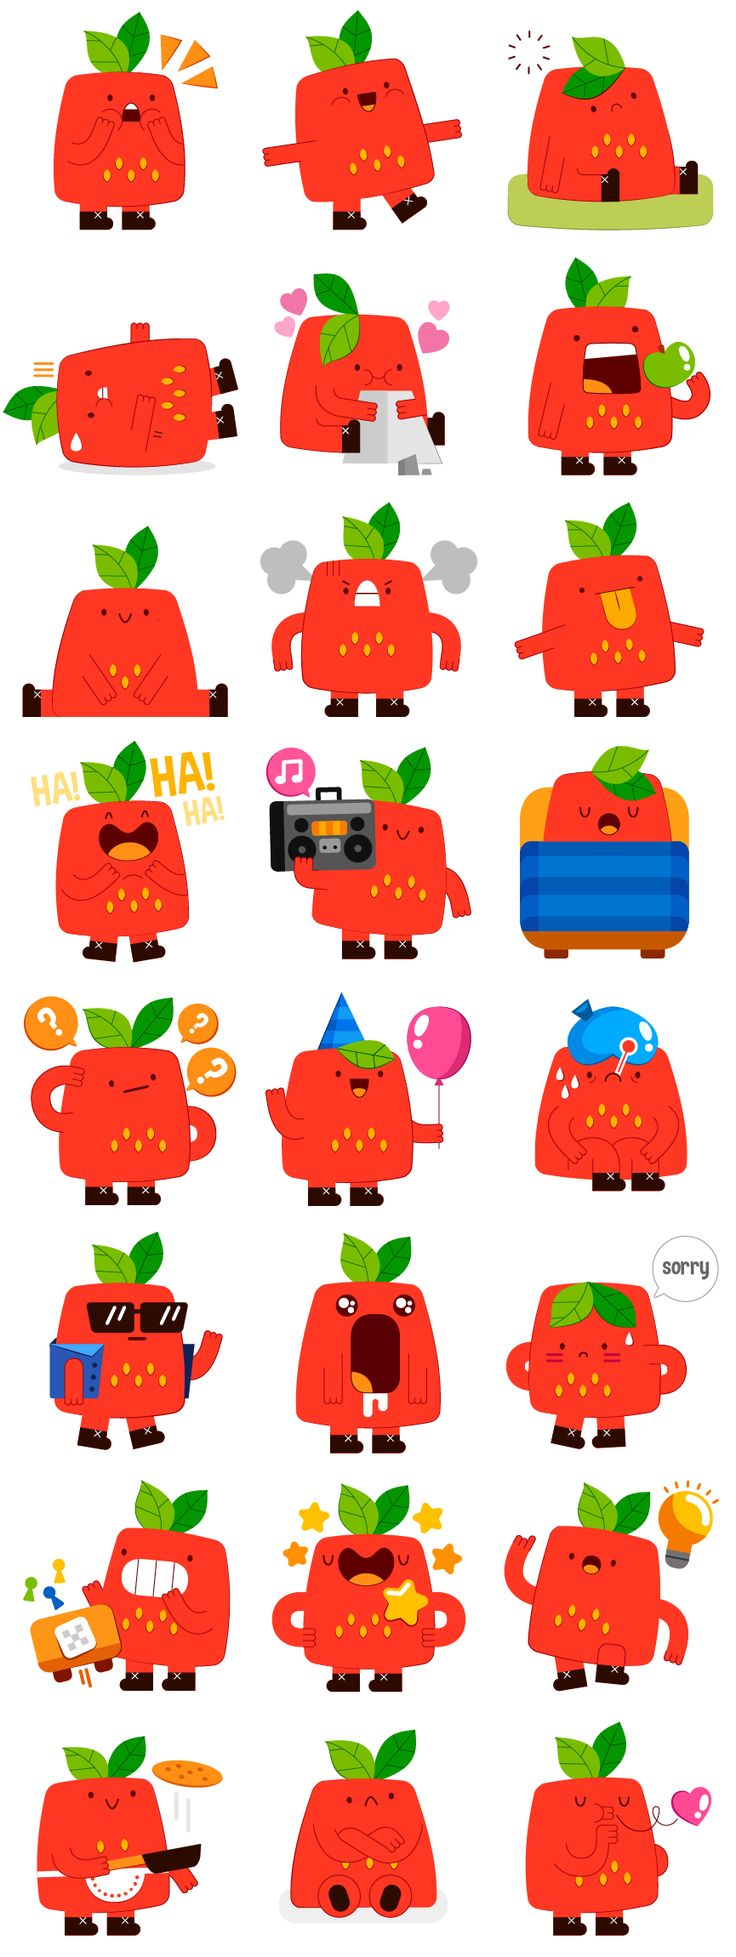 Strawberry buddy - Social Messenger app stickers on Behance